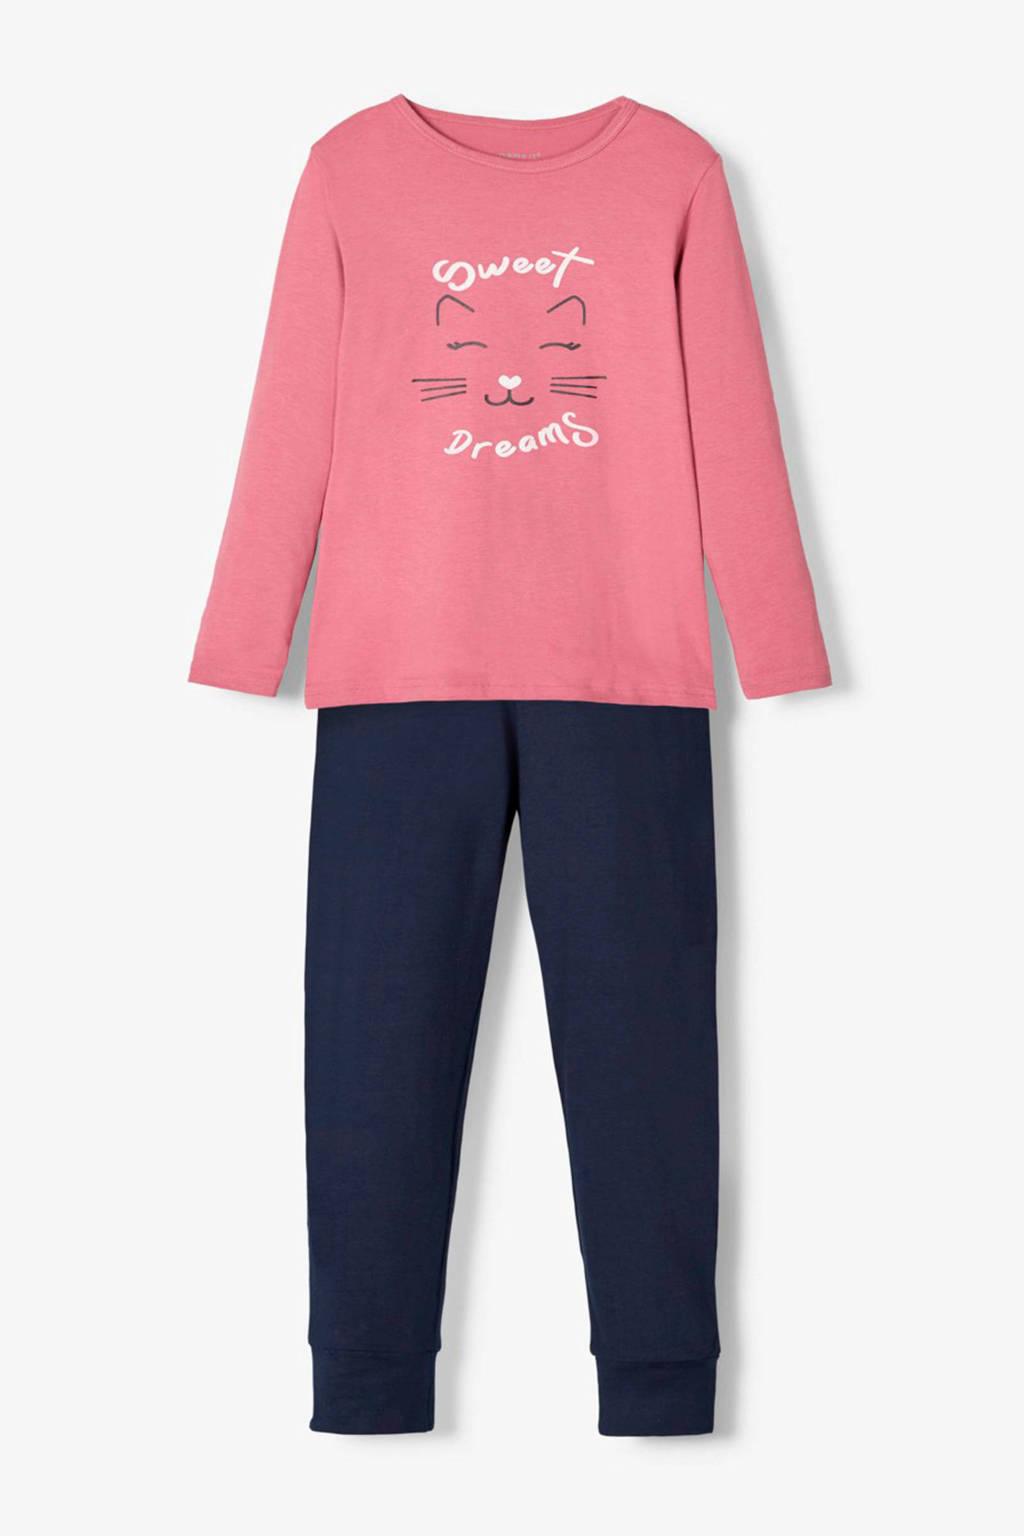 NAME IT MINI pyjama roze/donkerblauw met printopdruk, Roze/donkerblauw